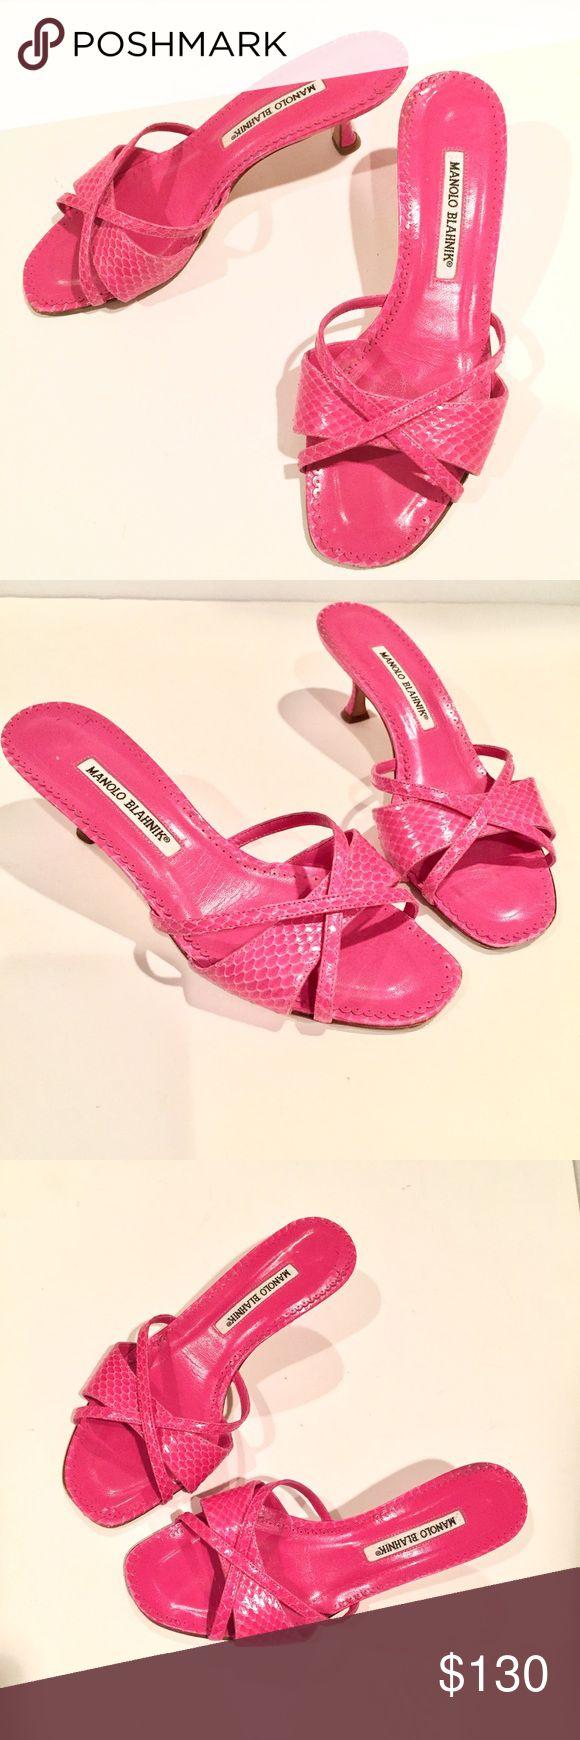 Pink Manolo Blahnik Sandals, Slides Snakeskin 38.5 Stunning pair of Manolo Blahnik snakeskin slide sandals with kitten heels! Size 38.5. Good used condition, please view all photos. Manolo Blahnik Shoes Sandals #manoloblahnikheelsfashion